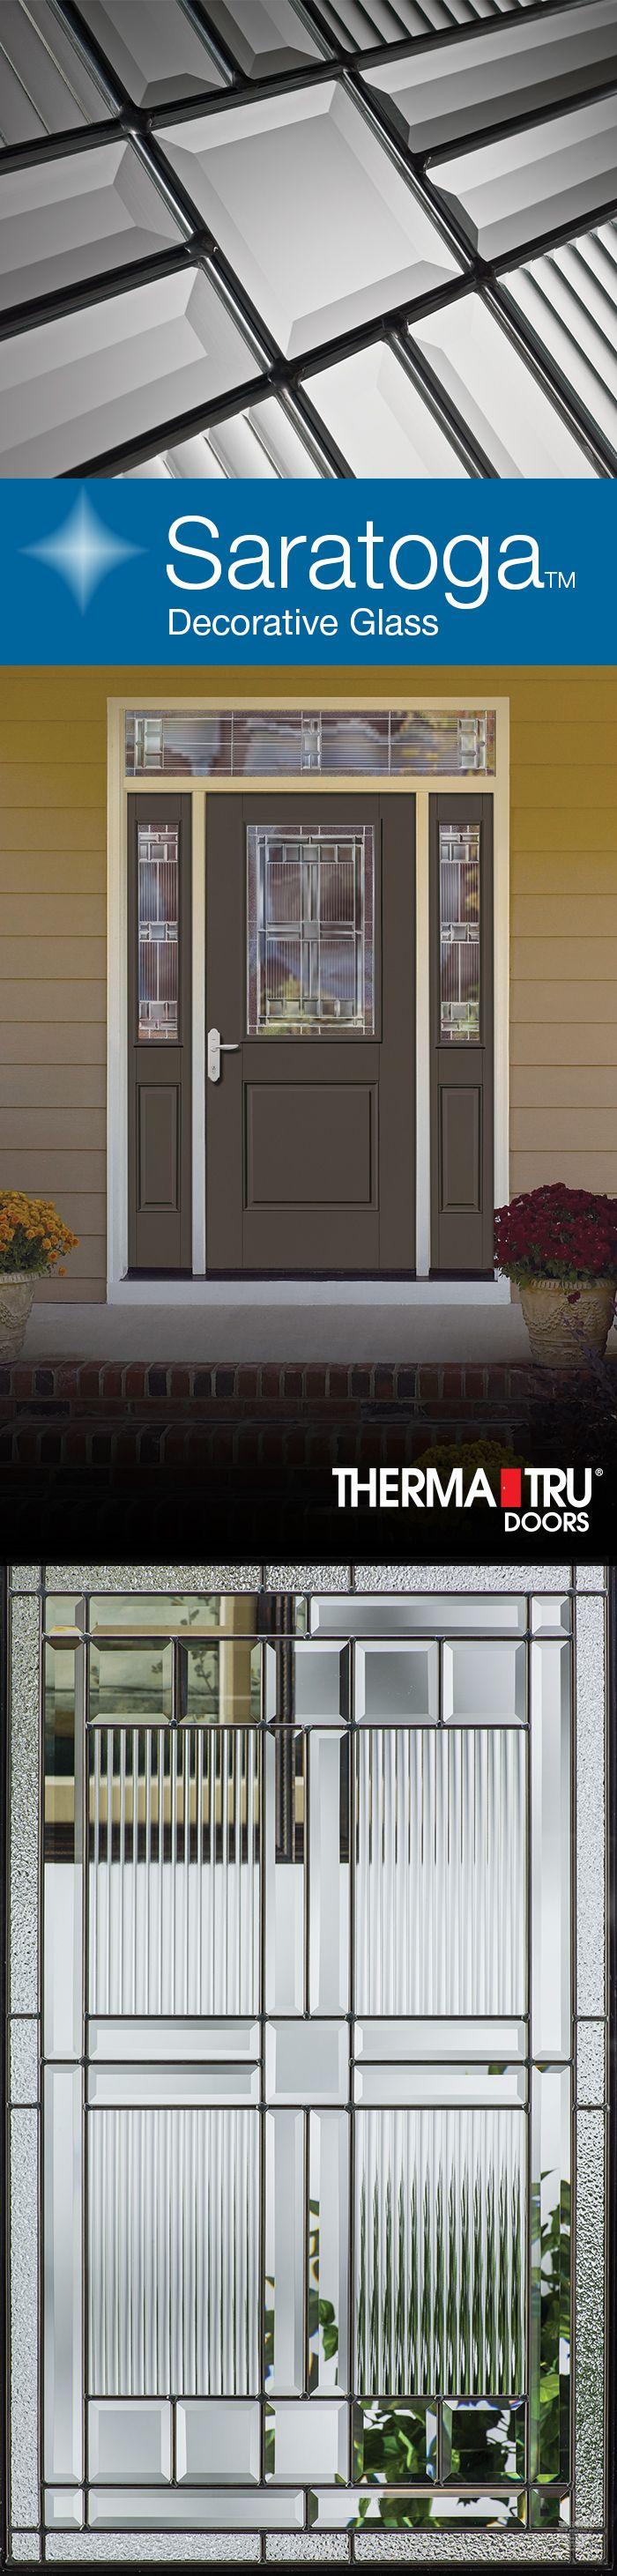 Best Images About Doors On Pinterest Patio Fiberglass Entry - Modern fiberglass entry doors